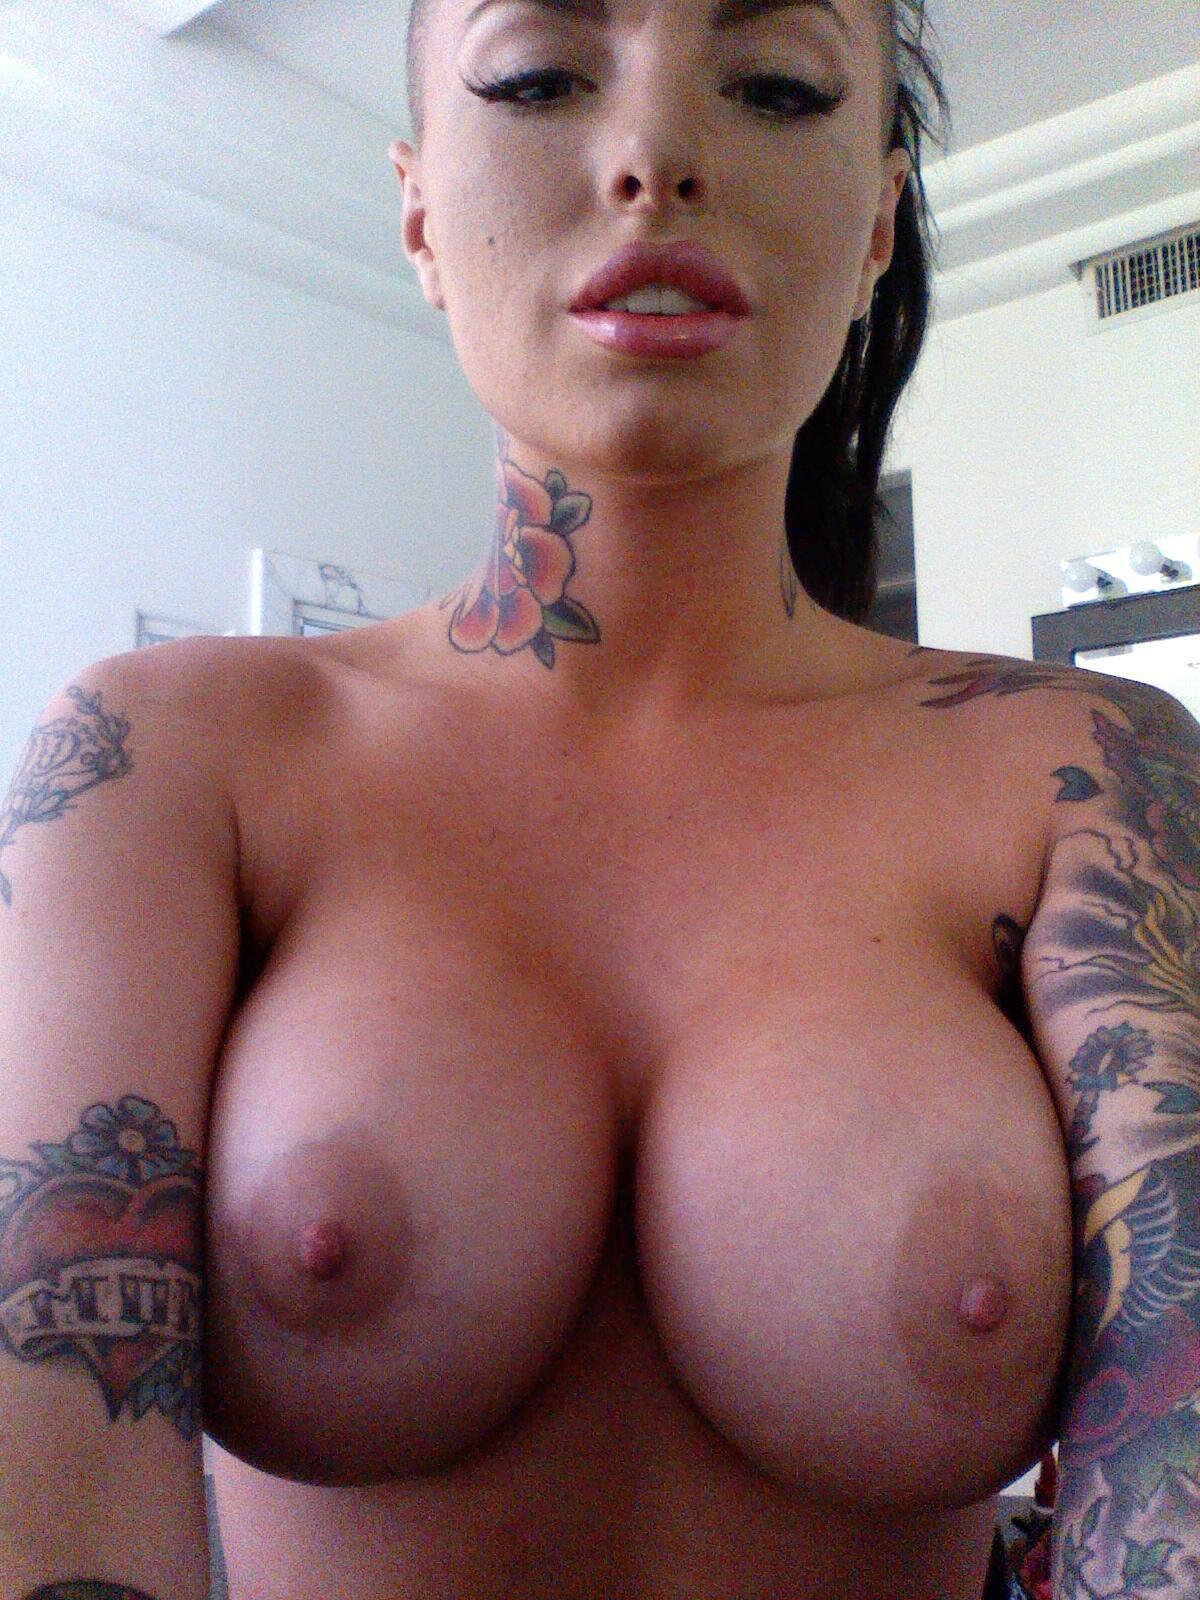 Boobs Christy Mack nudes (29 photo), Tits, Paparazzi, Feet, legs 2020